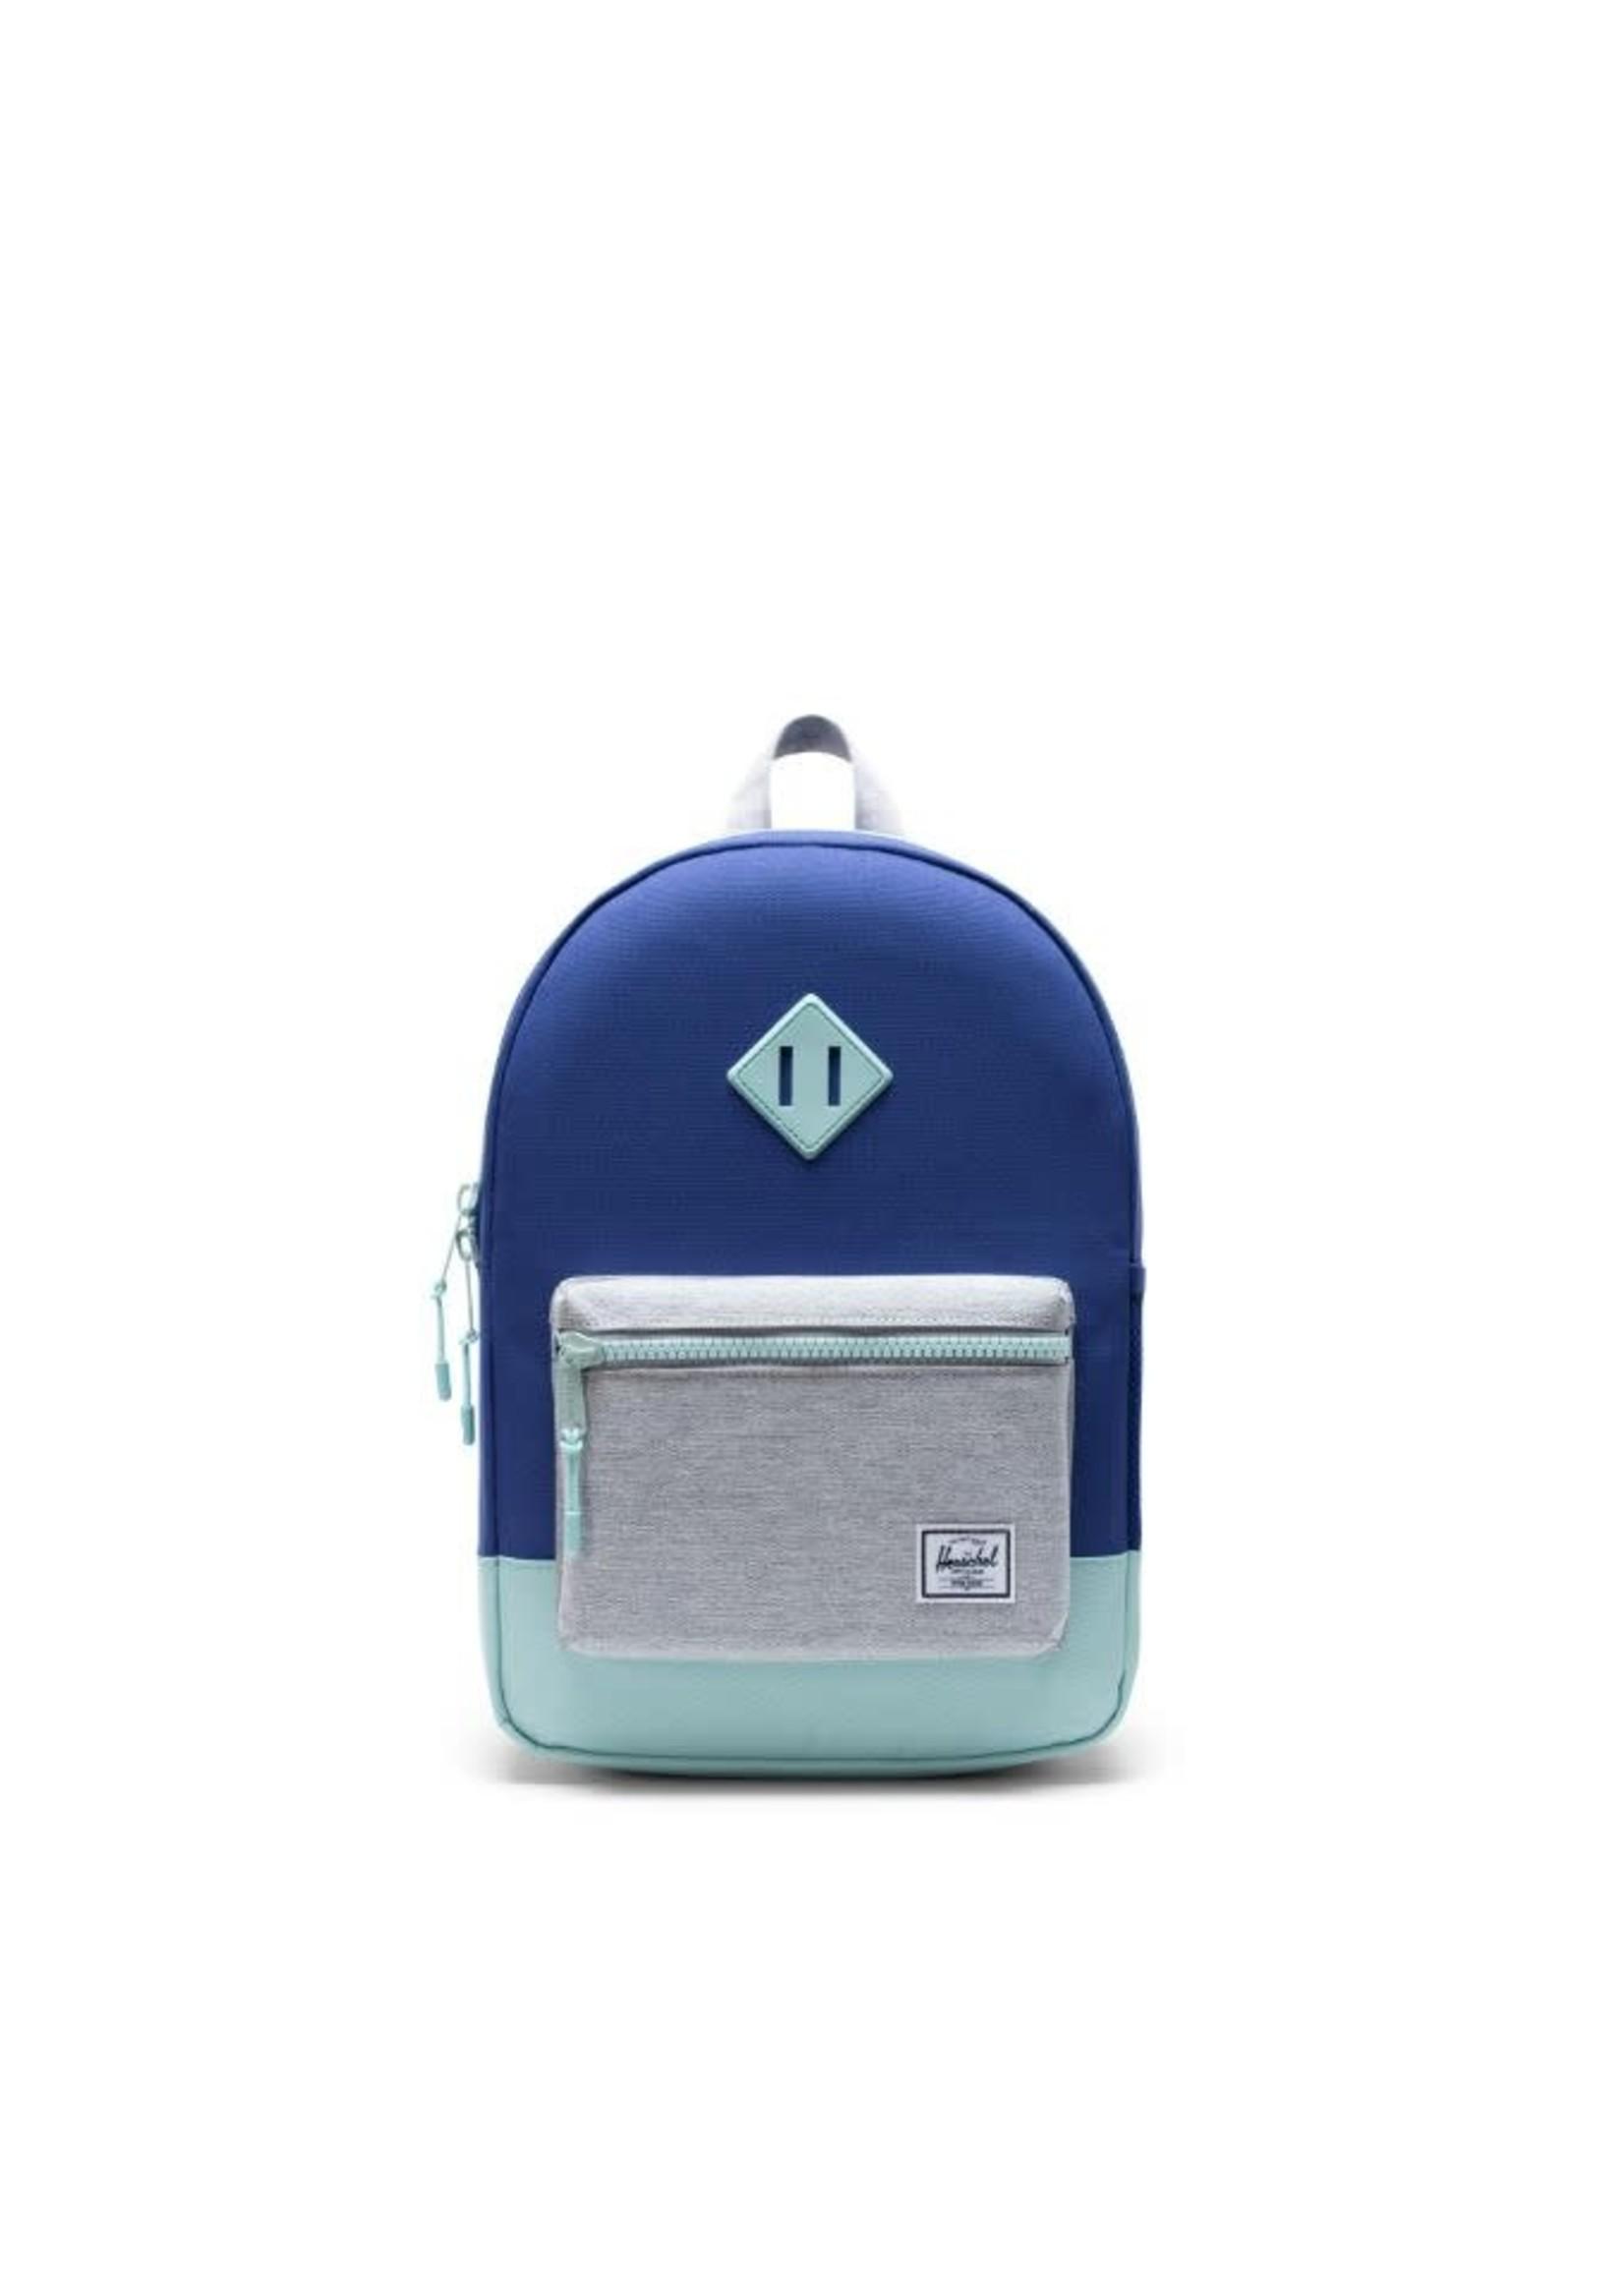 Herschel Supply Herschel Supply Heritage X-Large Youth Backpack (Orient Blue/Light Grey Crosshatch/Eggshell Blue)